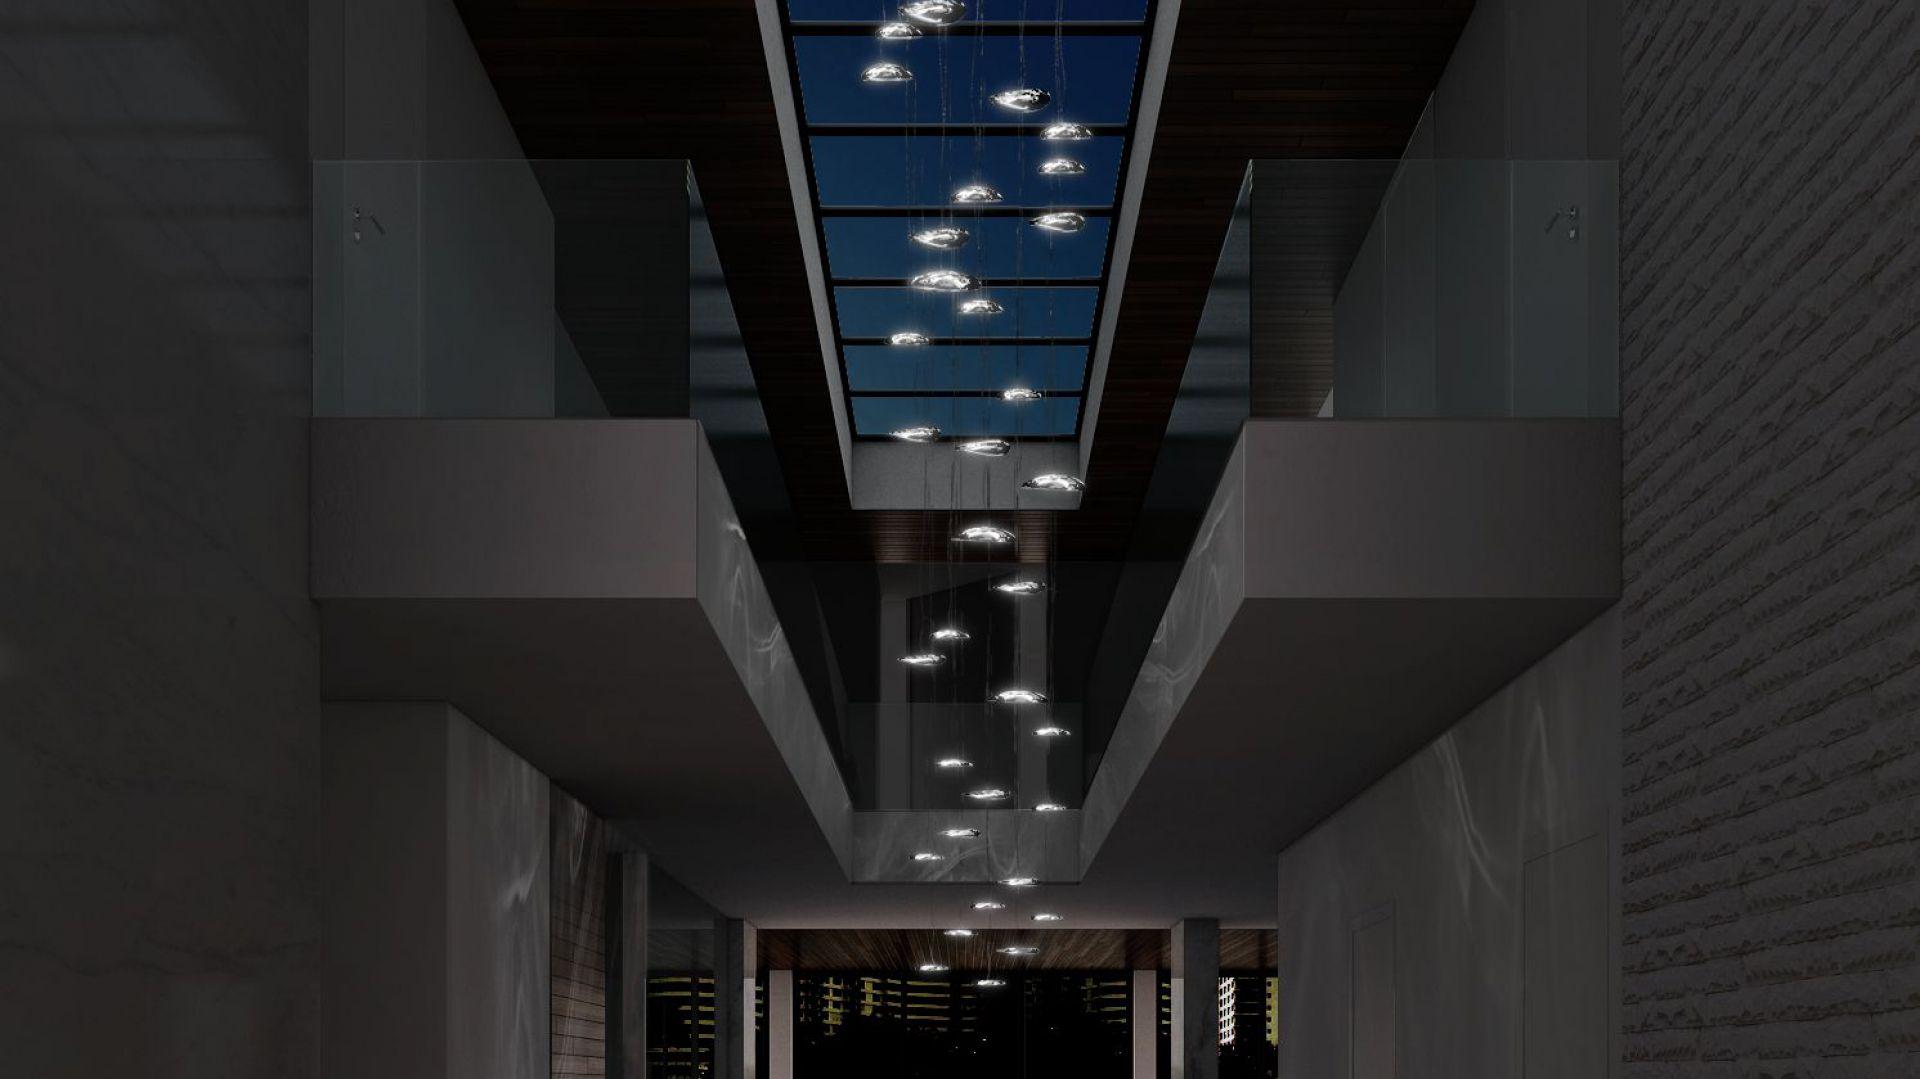 Lampa Manta. Fot. materiały prasowe marki Terzani